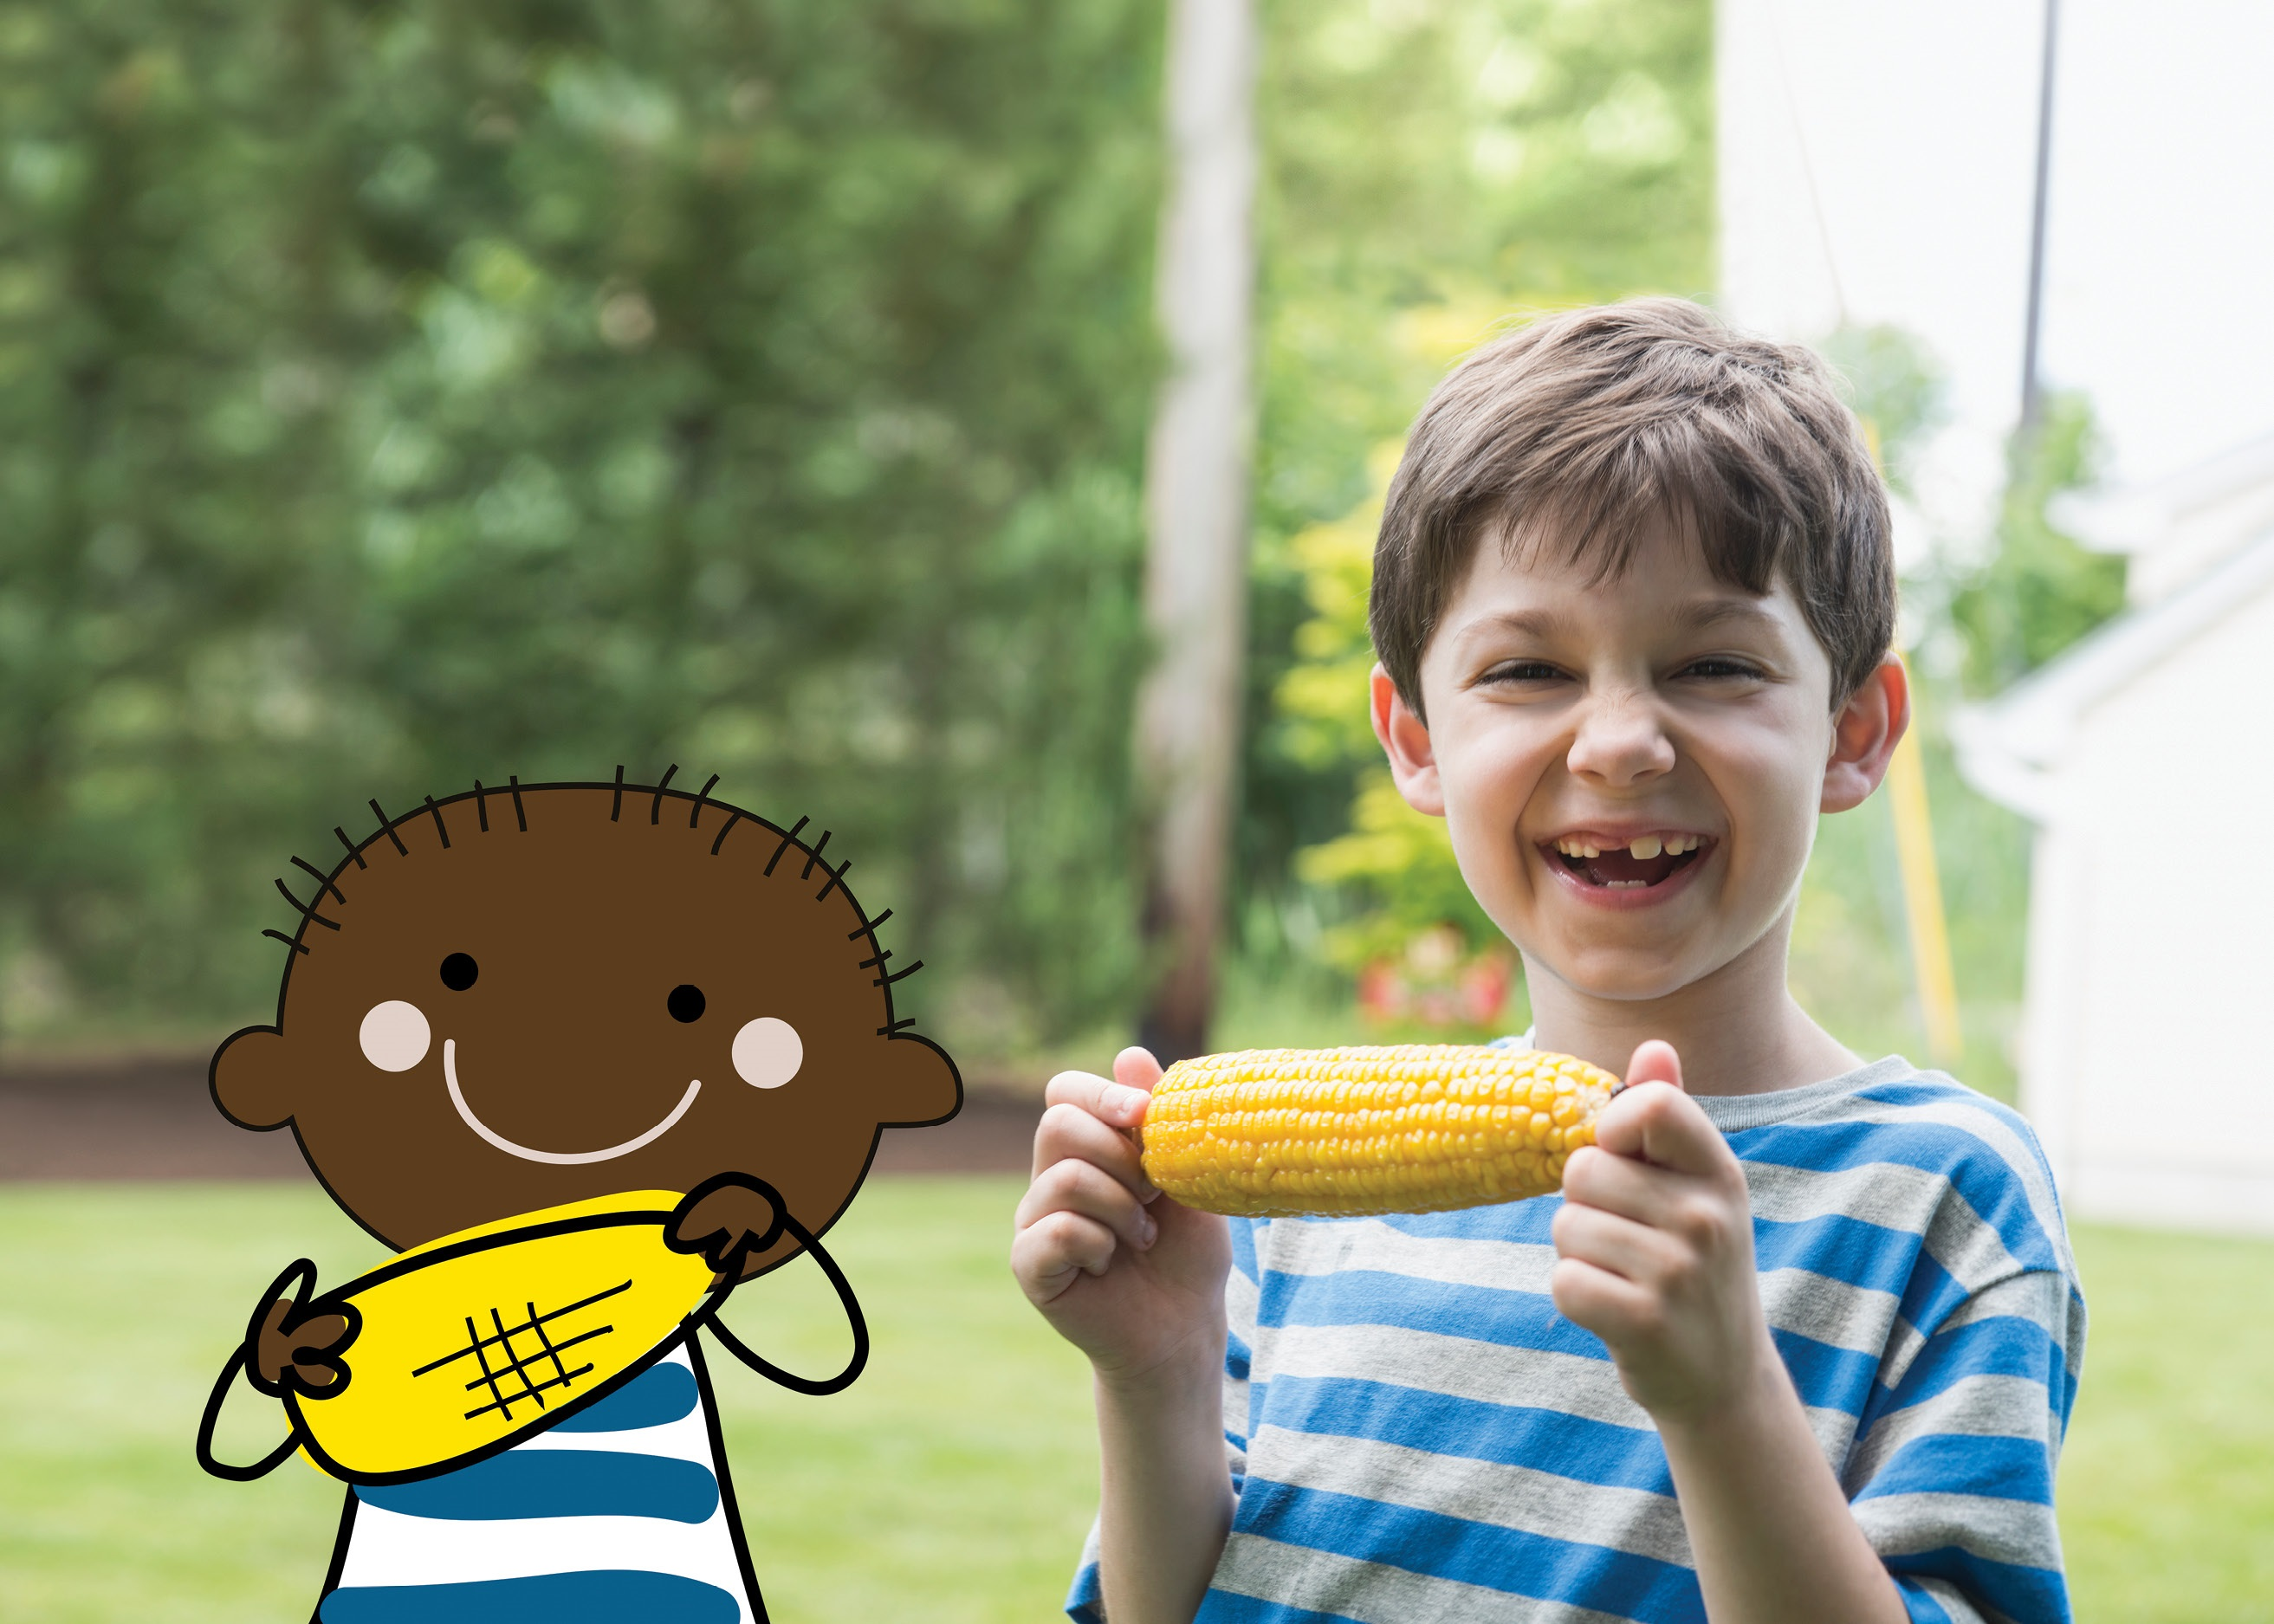 Healthy Kids Challenge Burlington - Boost veggies and fruits